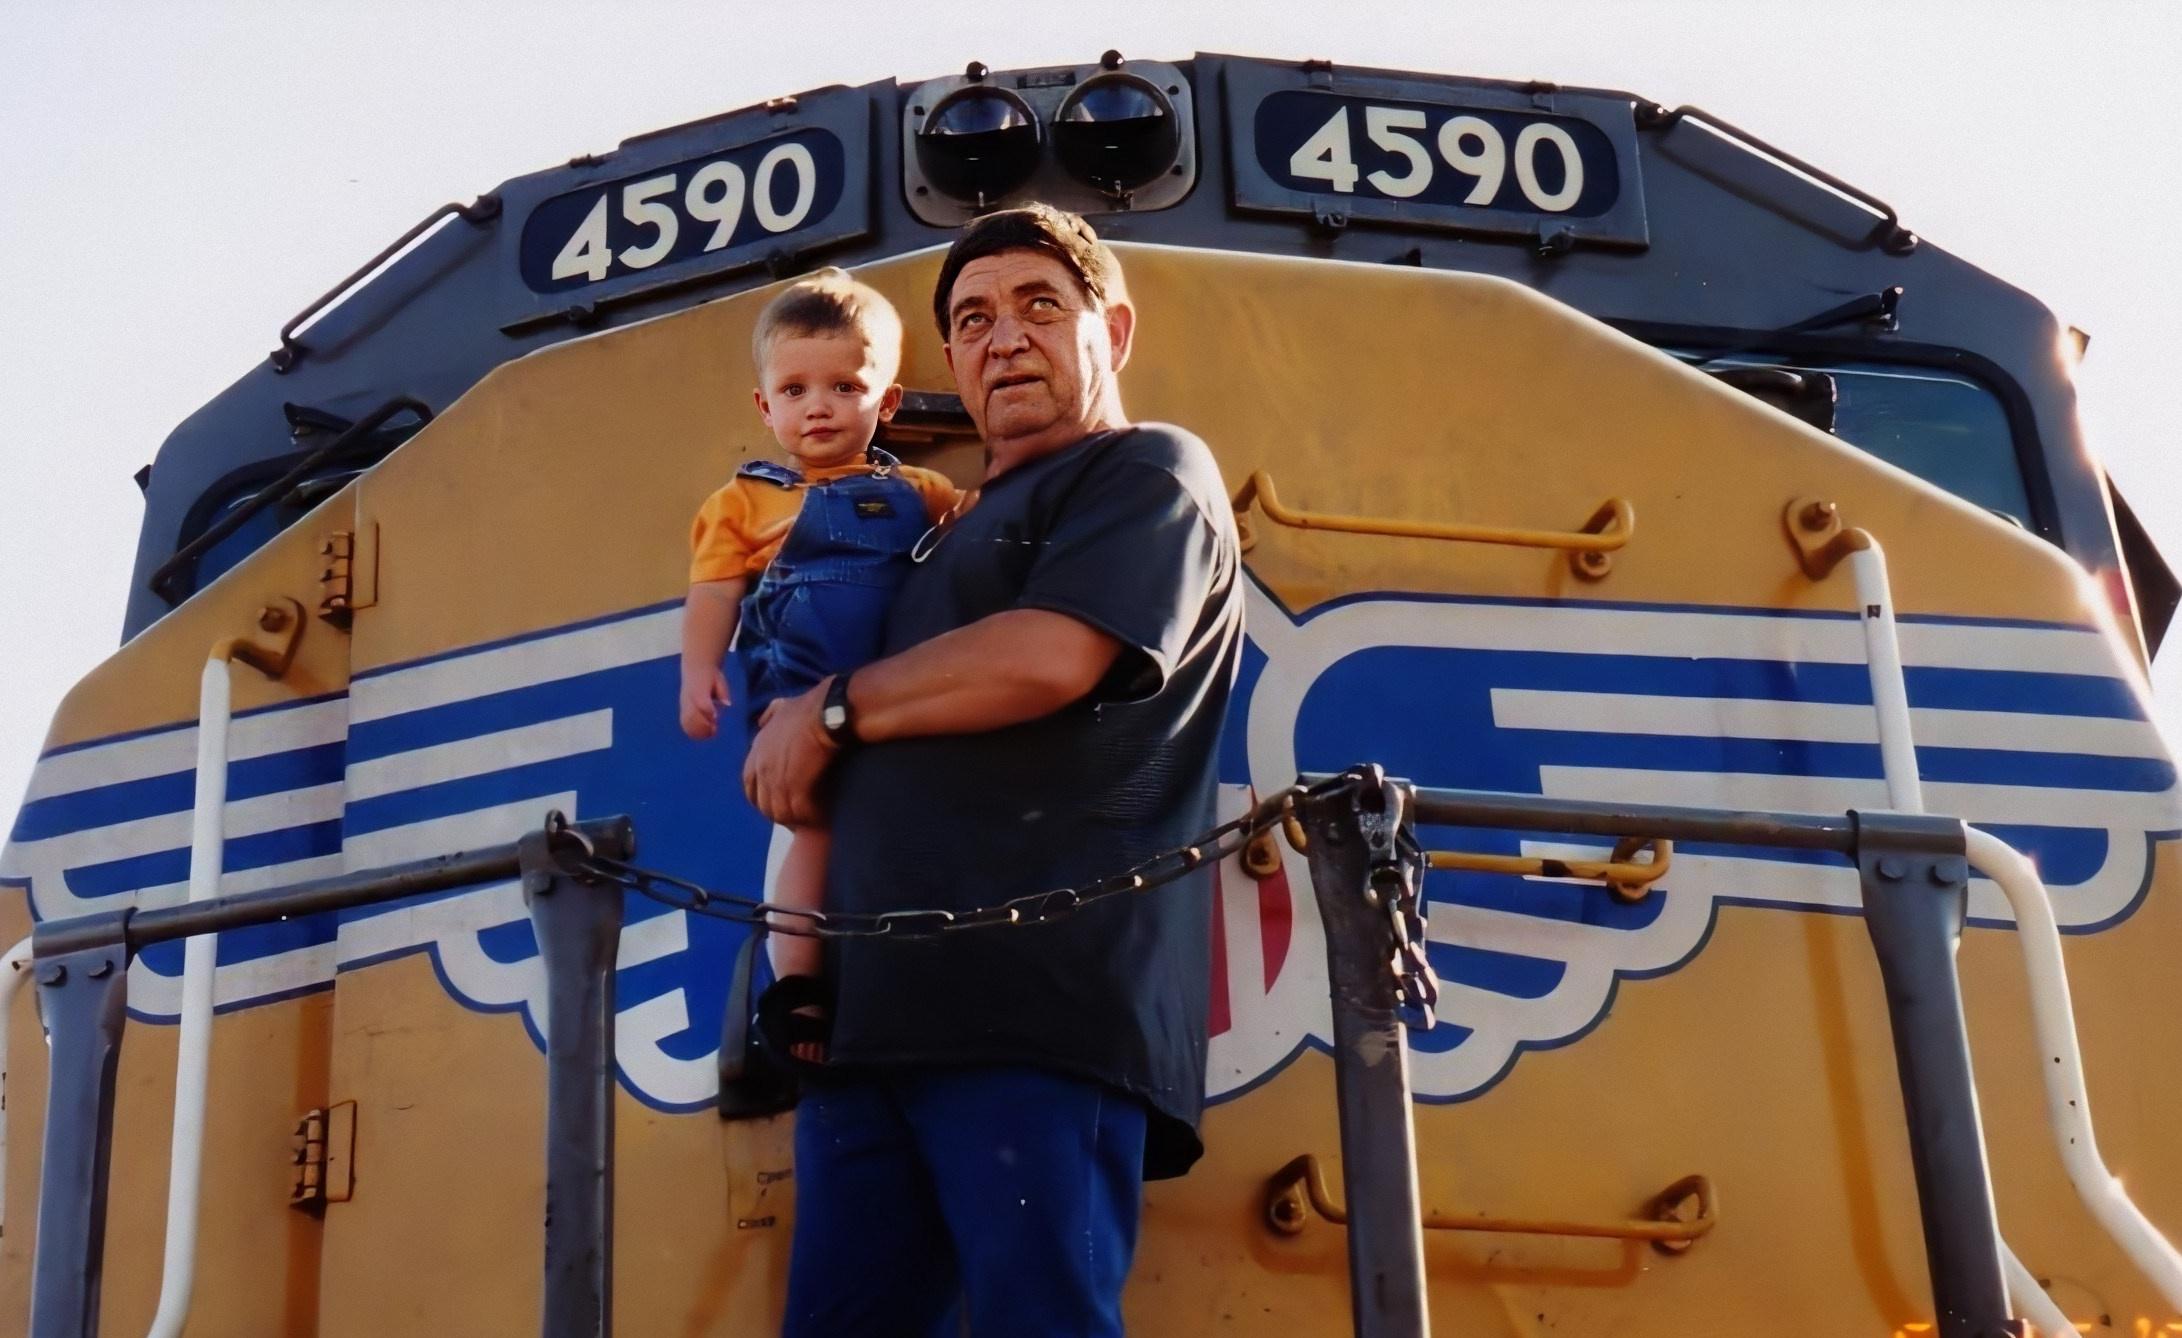 lolo train